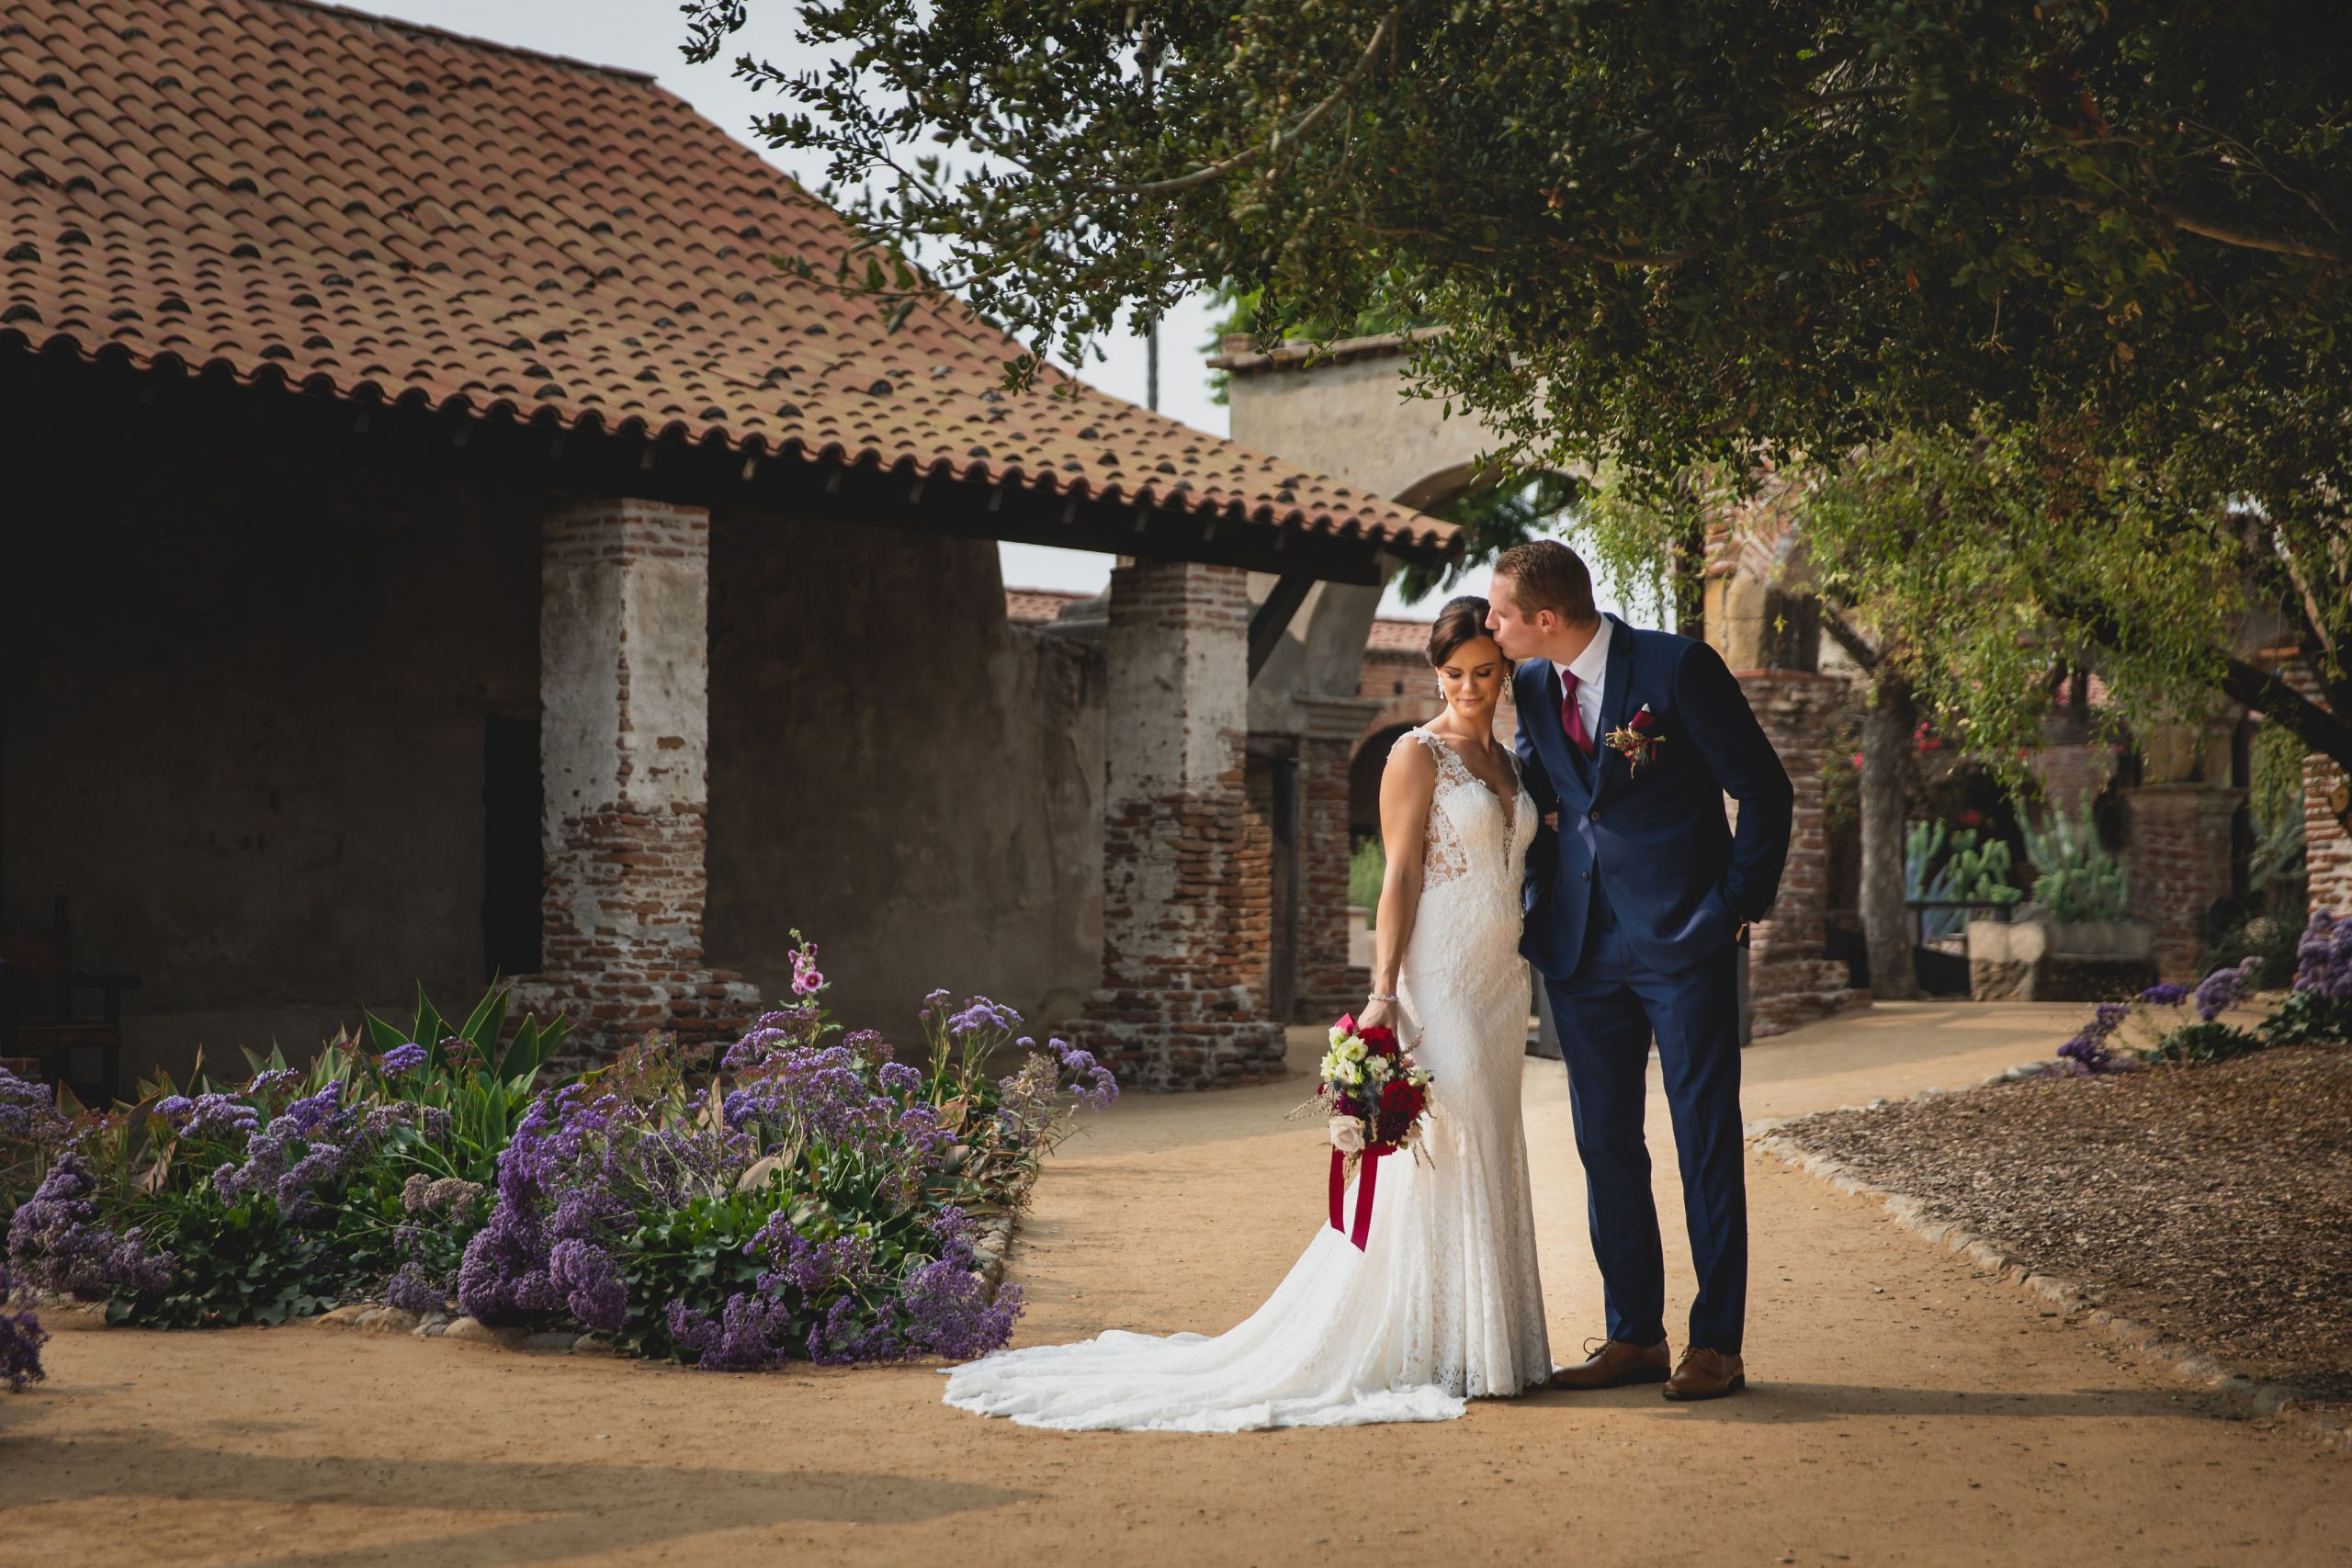 Reuland Sneak Peek wedding photography Yours Truly Media